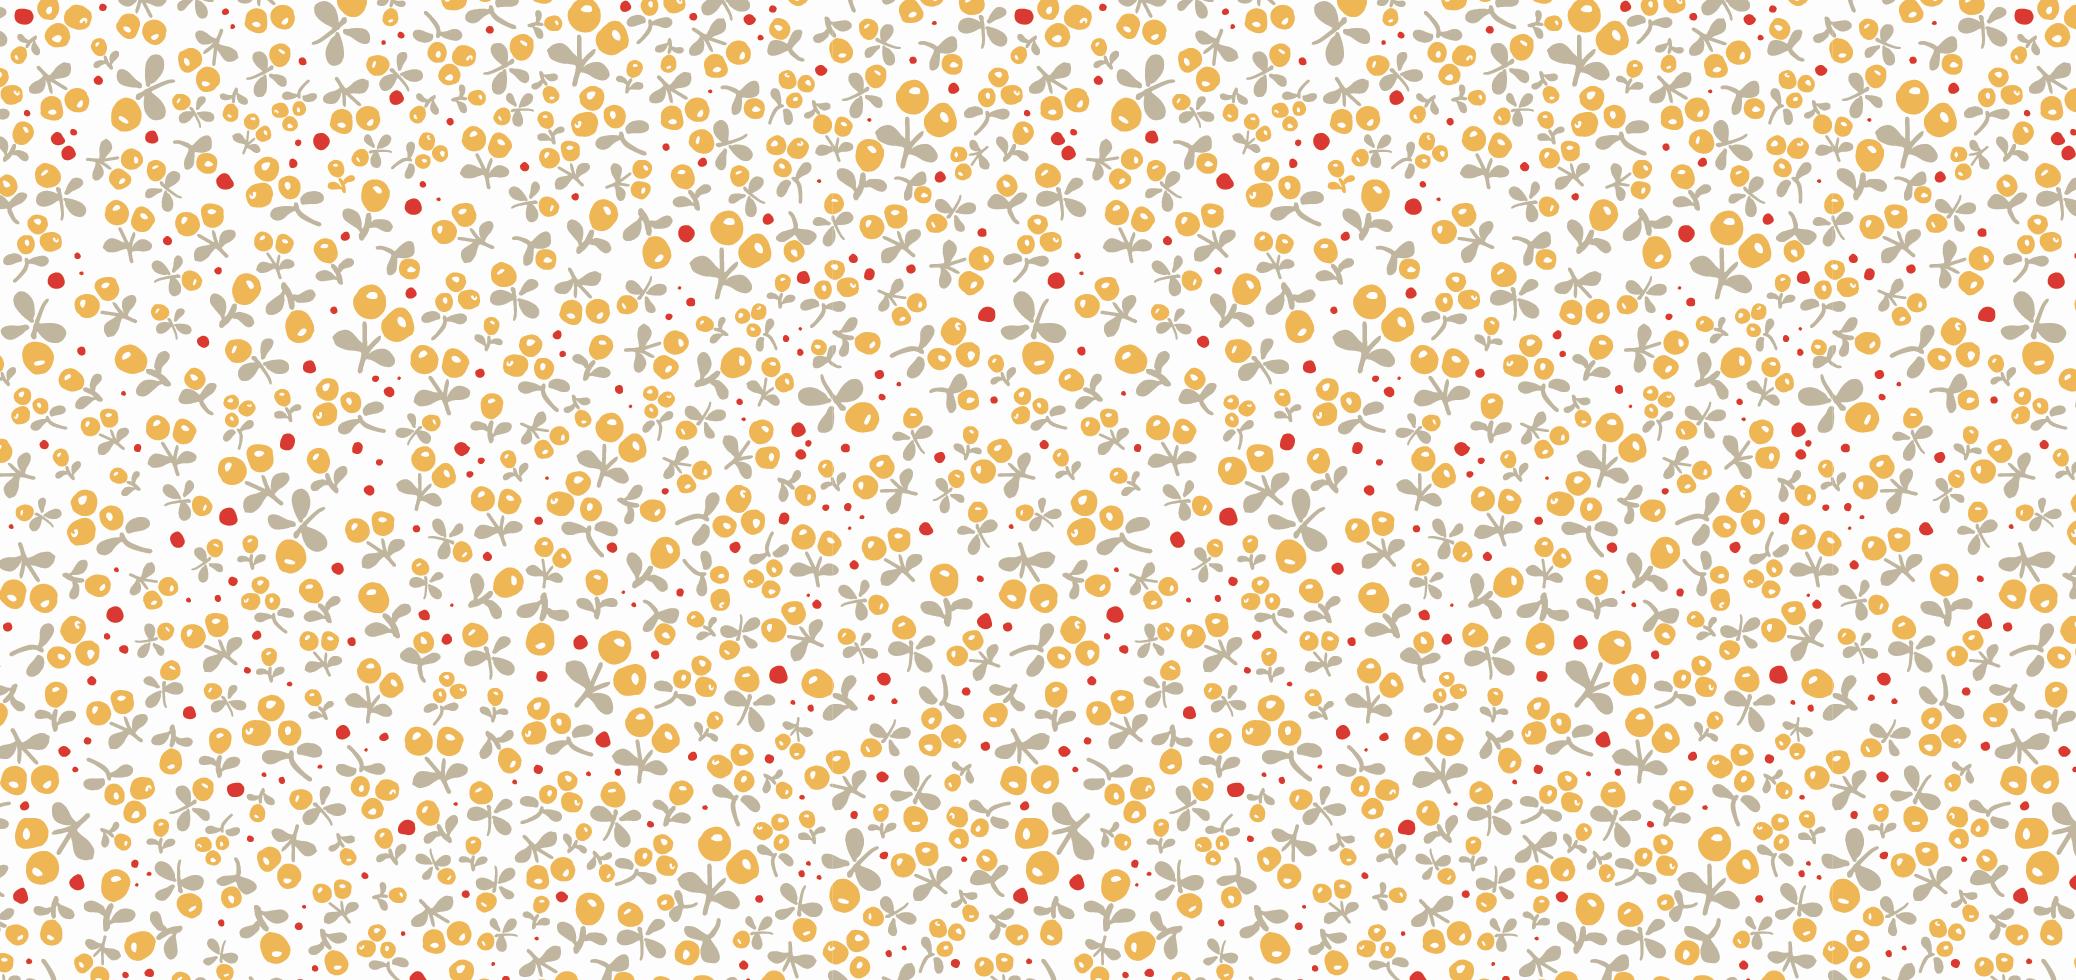 elena-wilken-walk-in-the-countryside-surface-pattern-design2.png